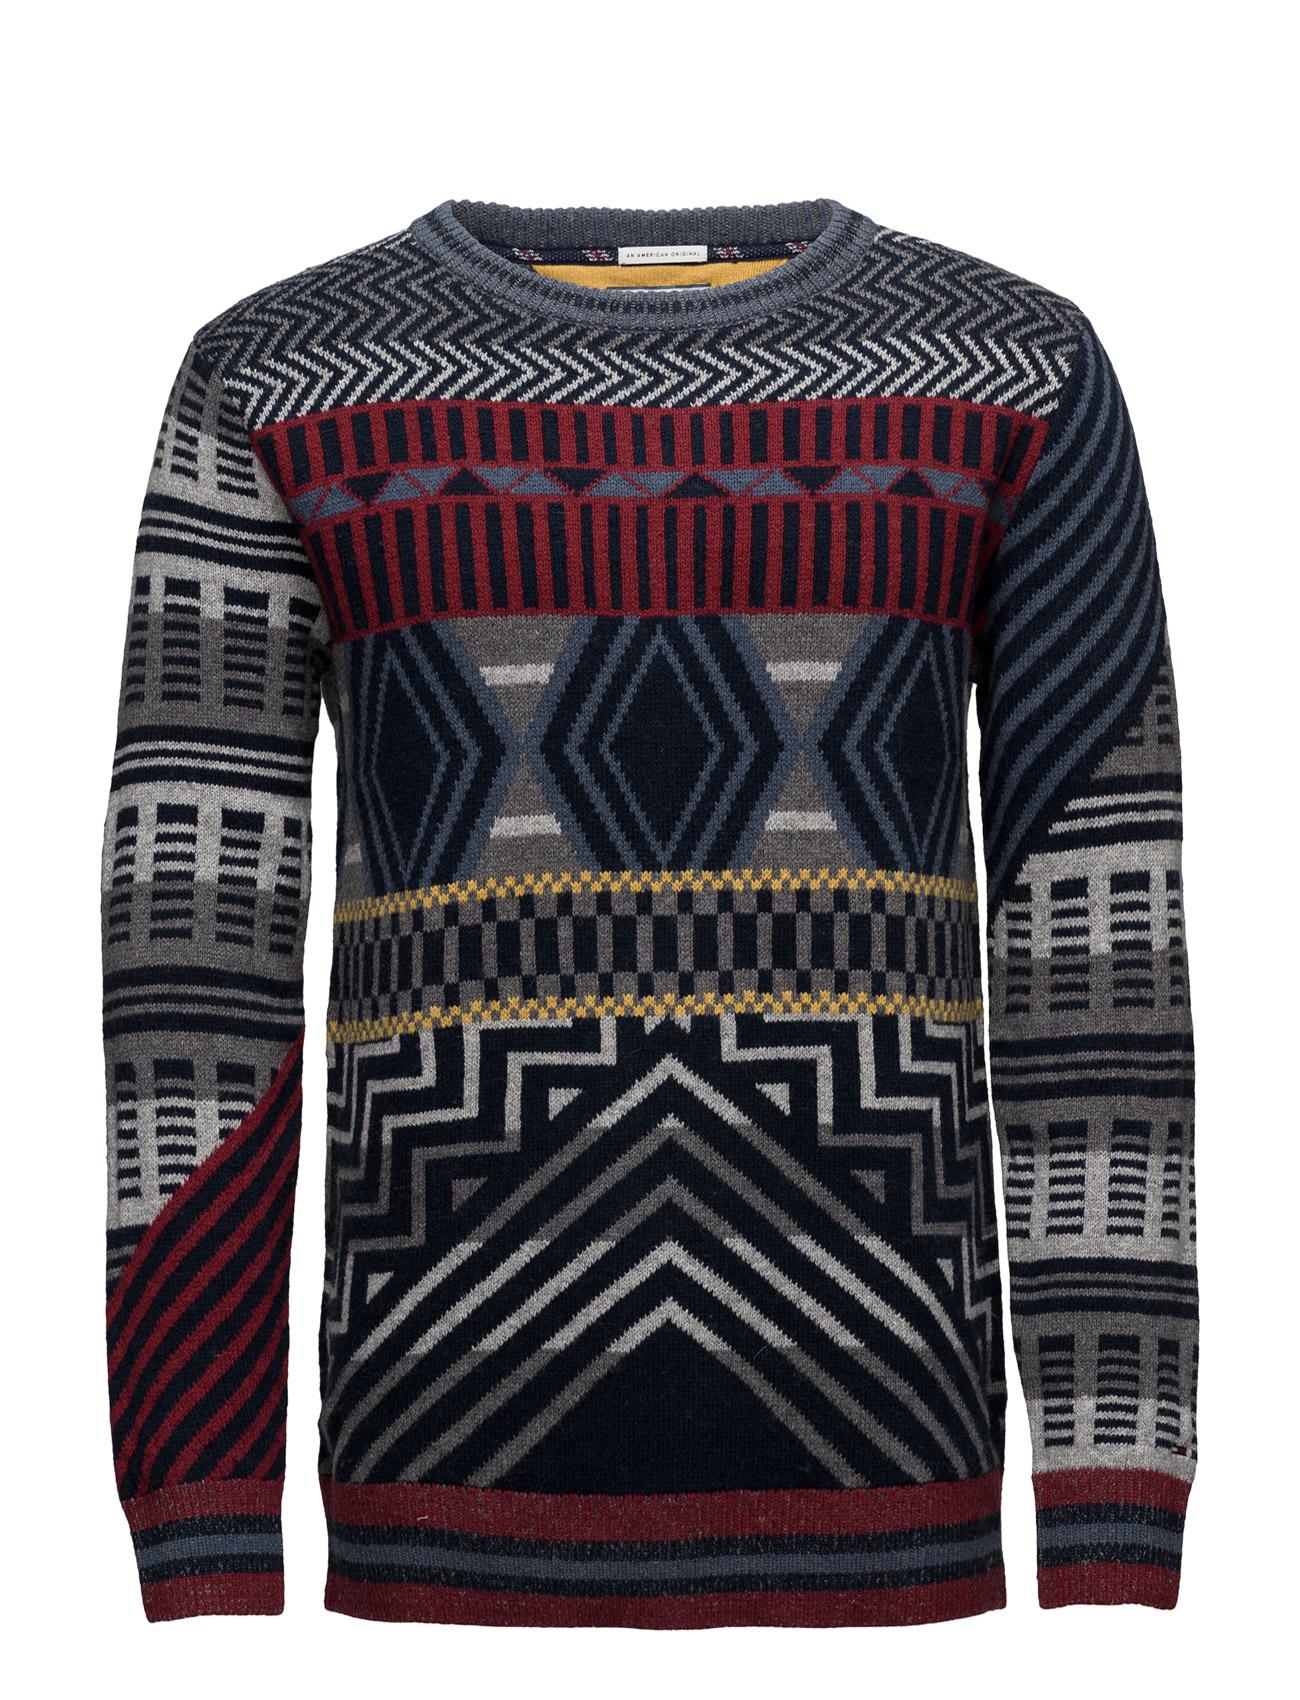 Thdm Cn Fairisle Sweater L/S 30 Hilfiger Denim Striktøj til Mænd i Grå